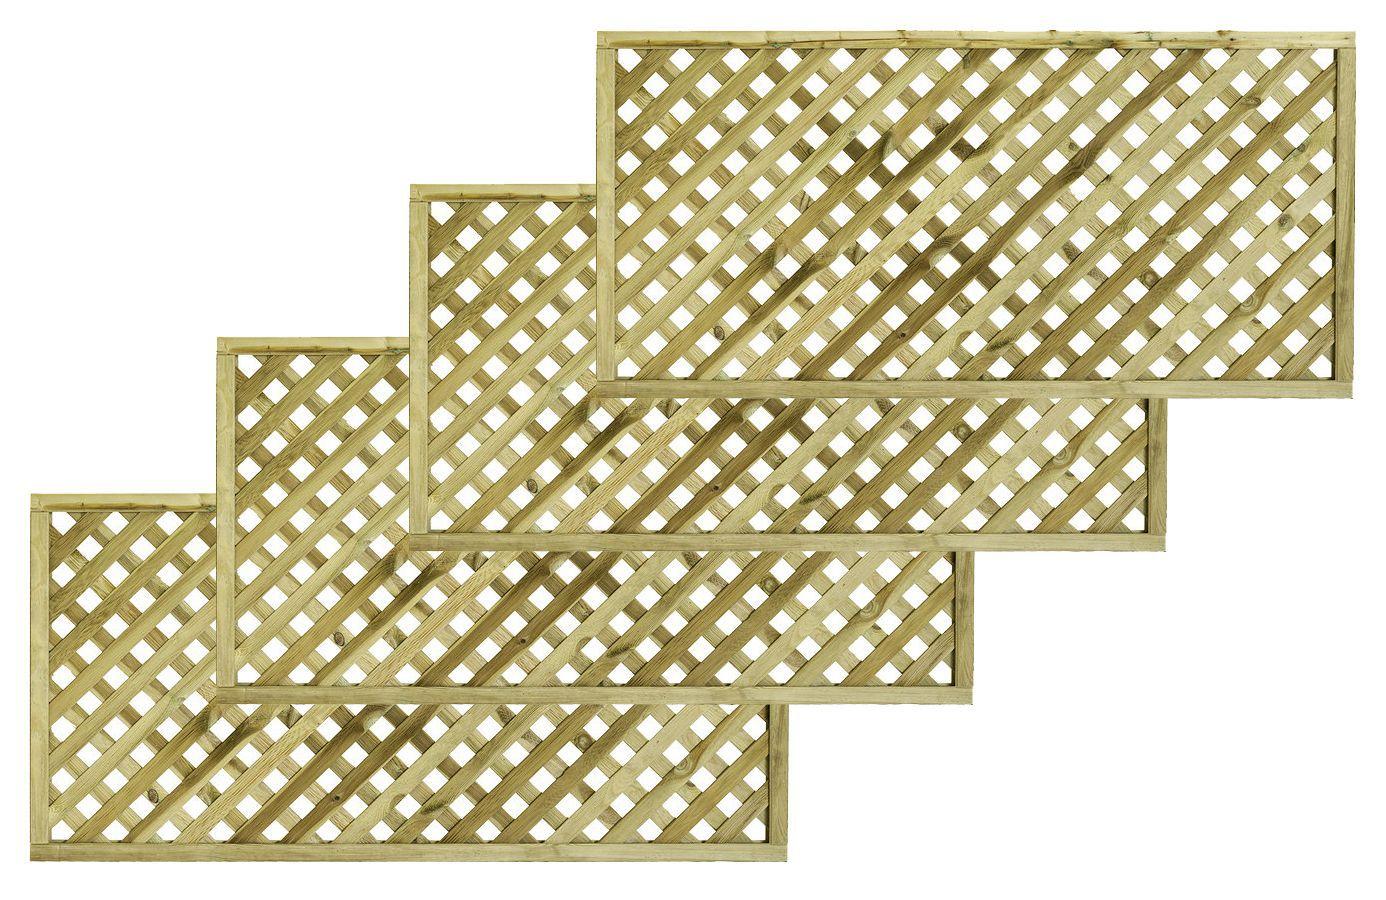 Woodbury Timber Square Trellis Panel (h)1.8m(w)0.9 M, Pack Of 4